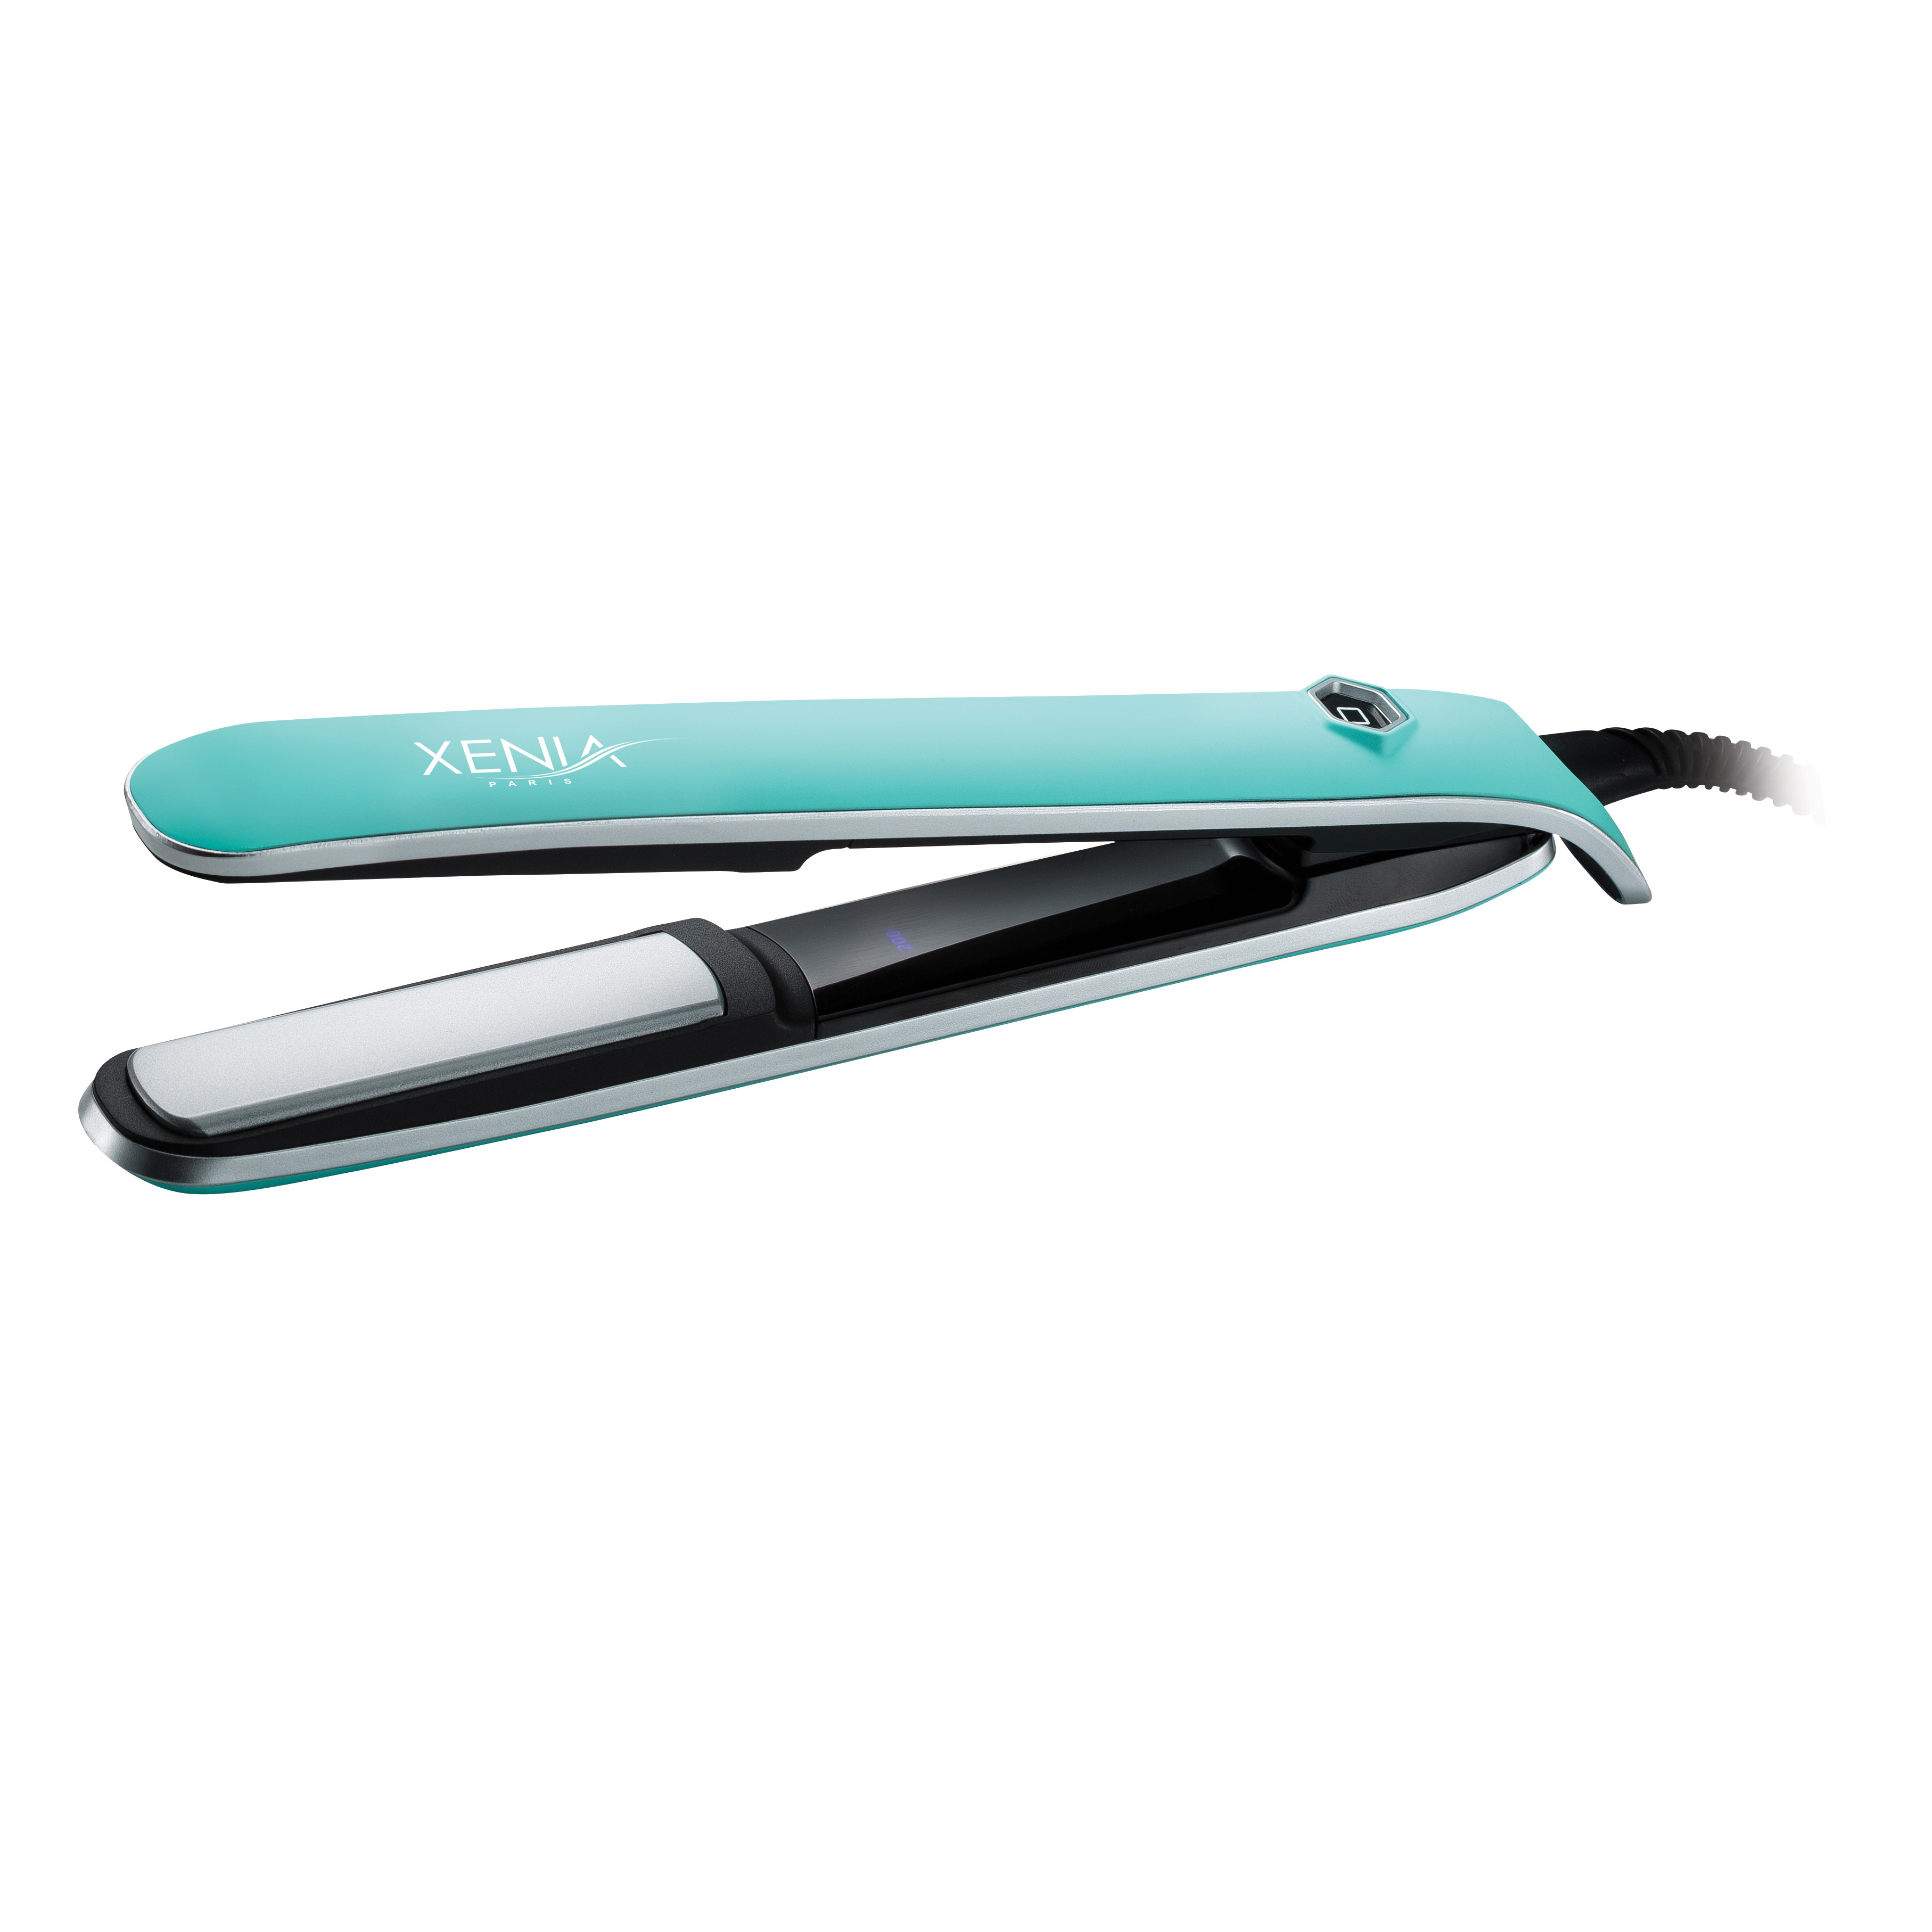 "Xenia Paris Sleek 1"" Professional Hair Straightener (Rubber Touch)-Turquoise"